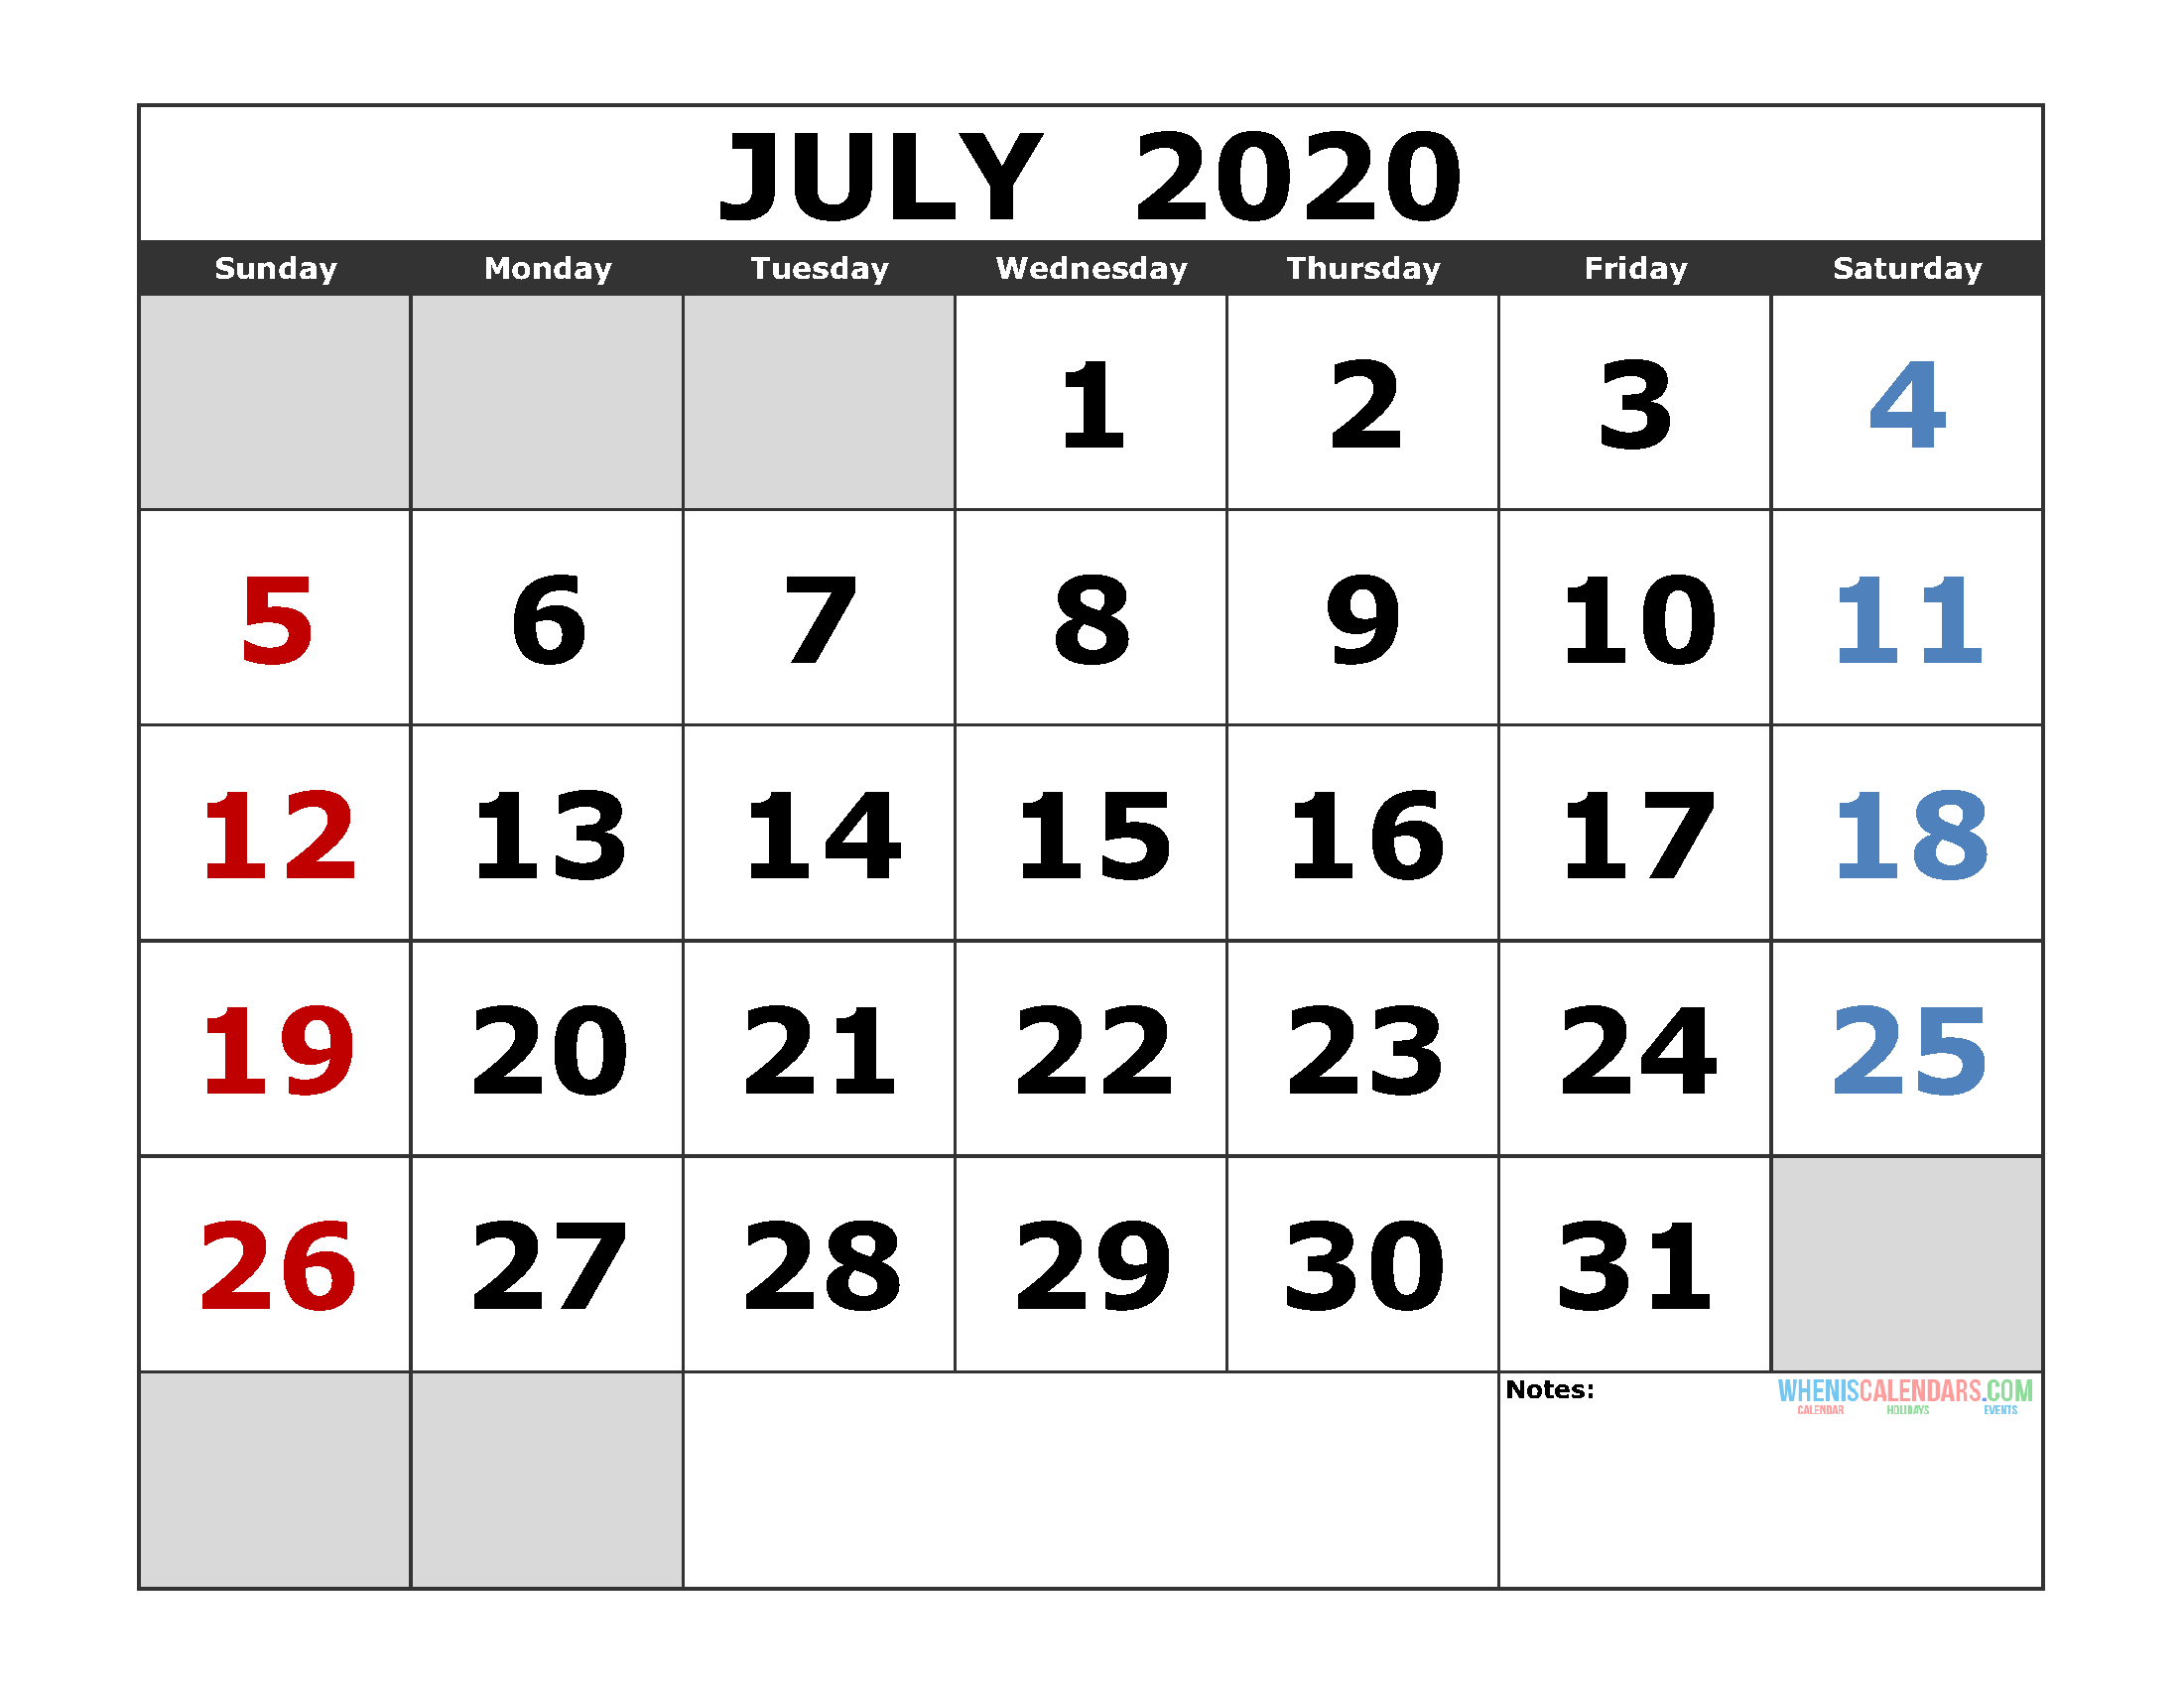 July Calendar For 2020.July 2020 Printable Calendar Template Excel Pdf Image Us Edition